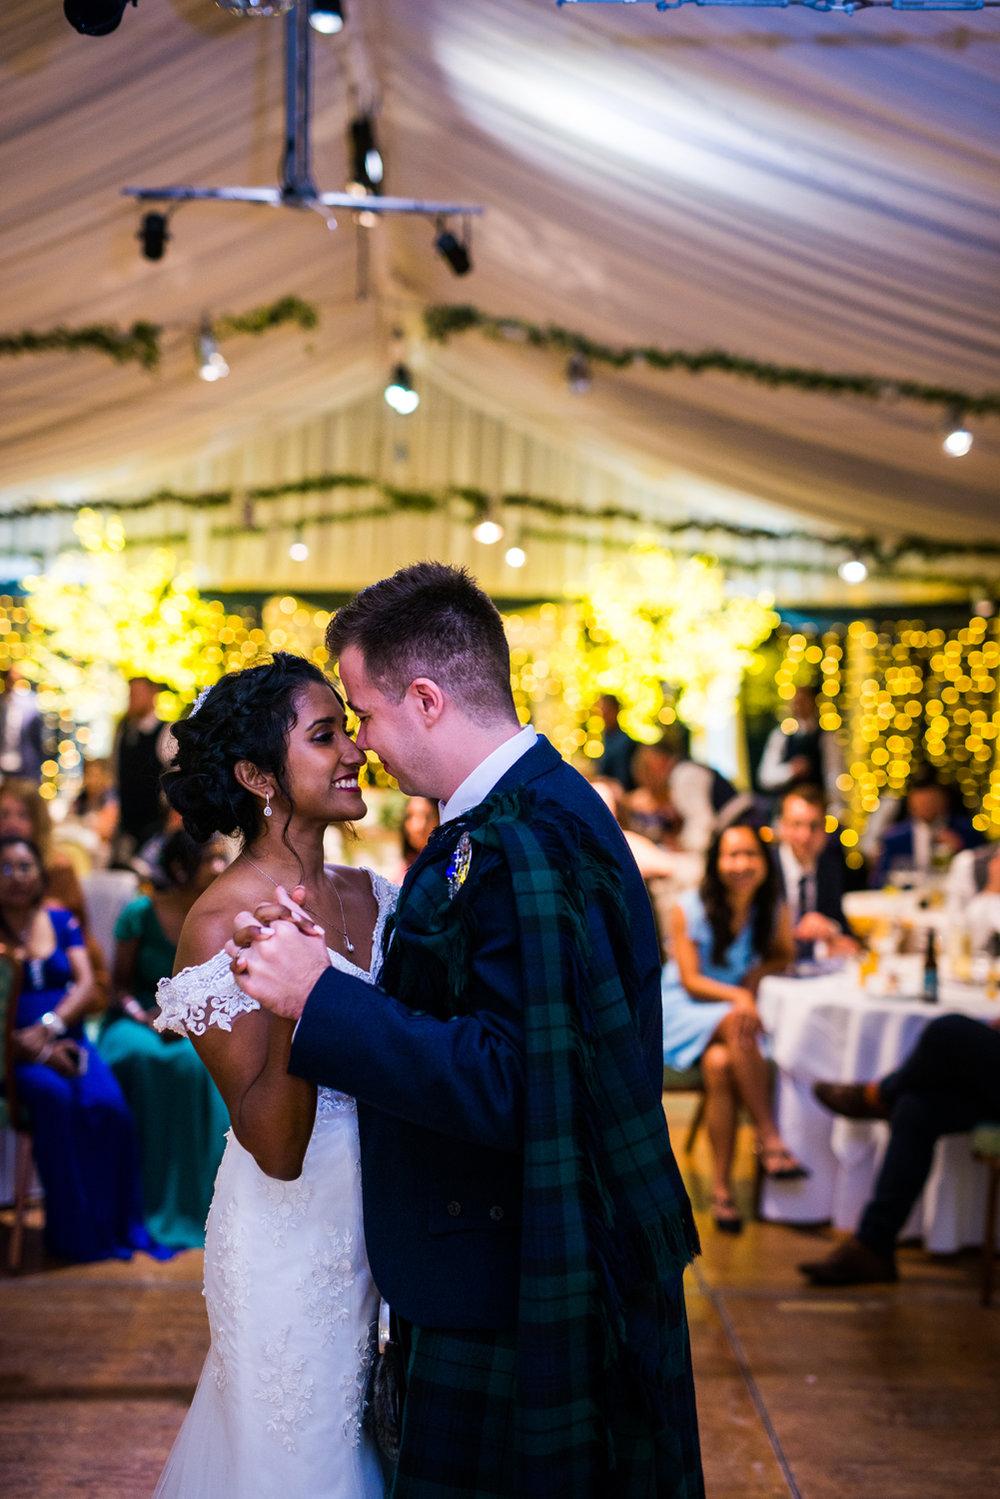 Kev and Shrabani wedding photos (322 of 350).jpg